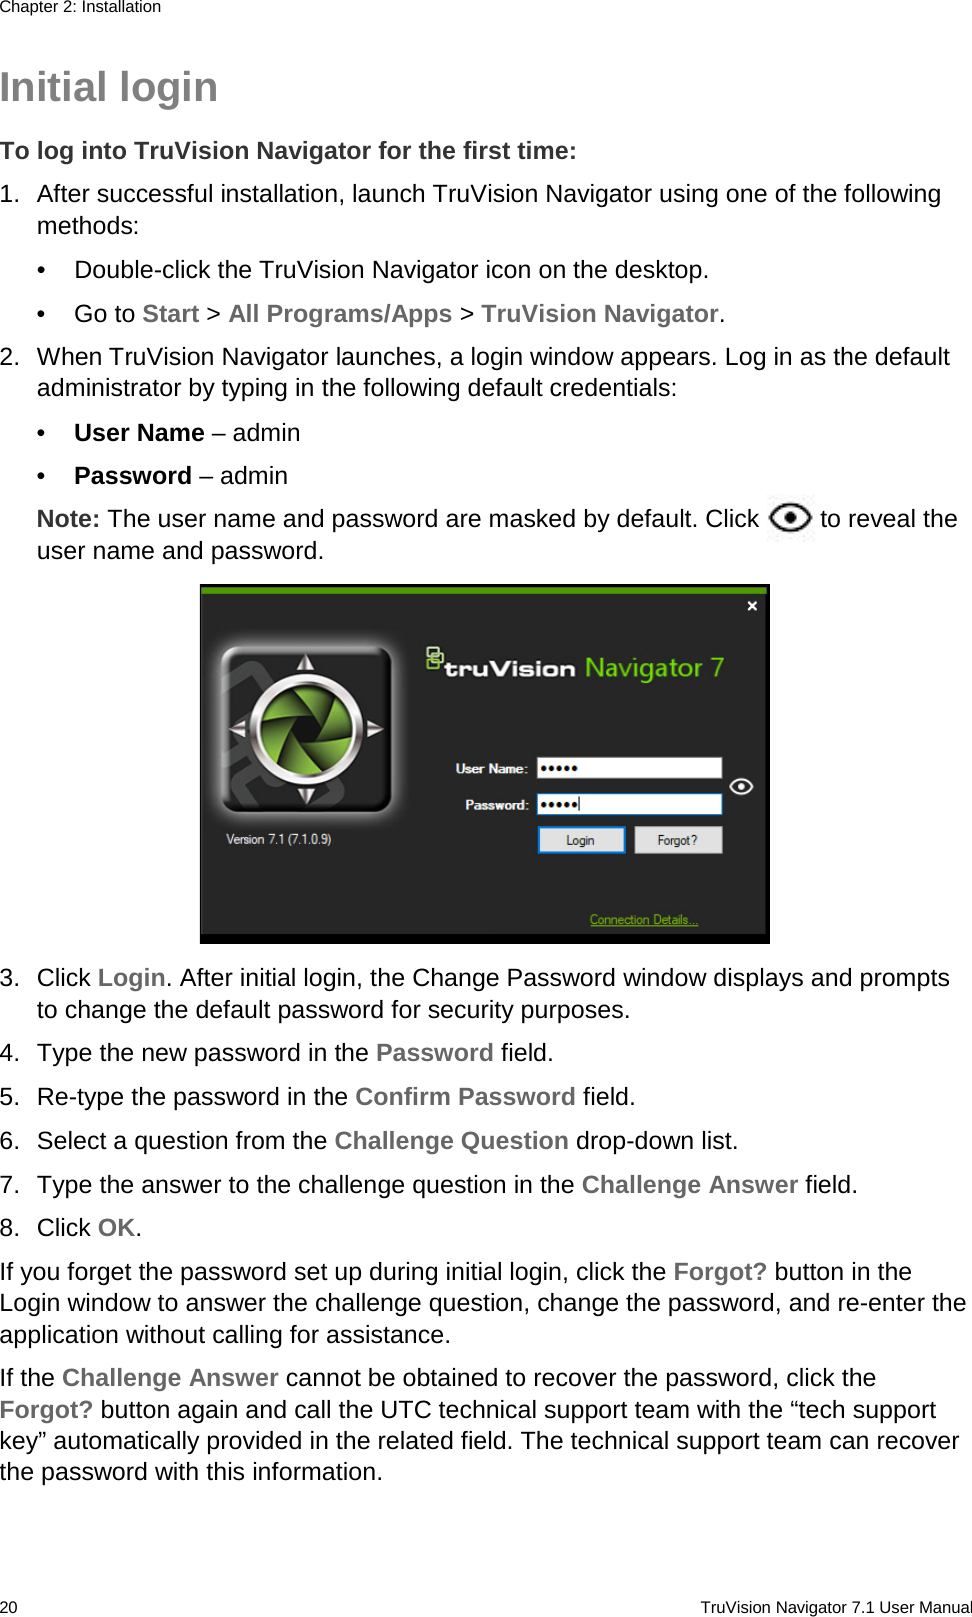 InterLogix 1073272B Truvision Navigator 7 1 User Manual En 7 1